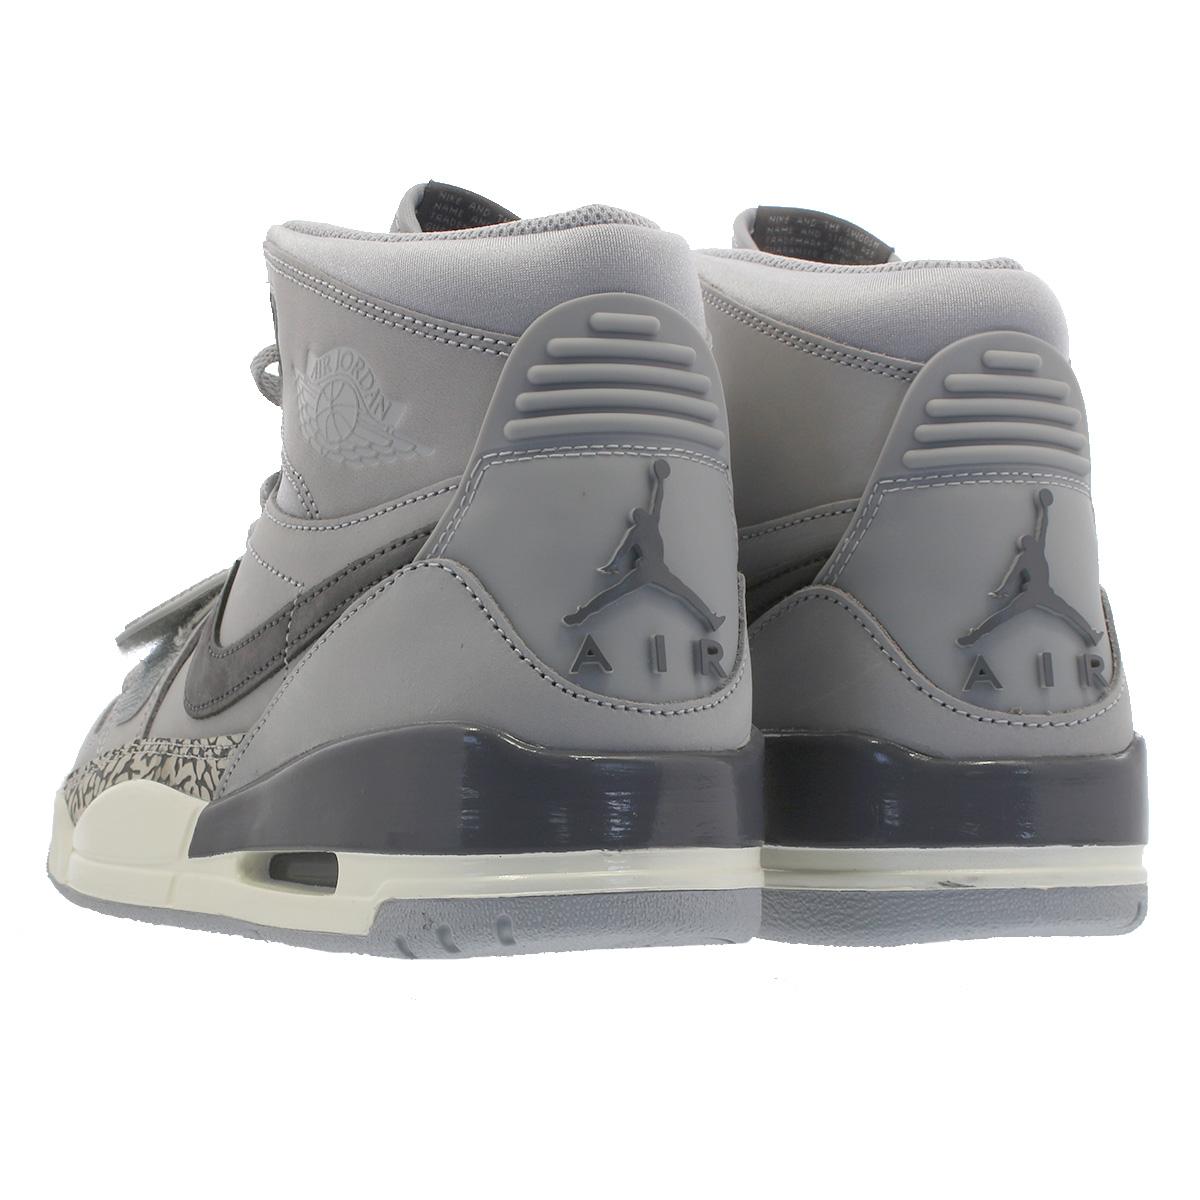 new style dc5b1 b43ec NIKE AIR JORDAN LEGACY 312 Nike Air Jordan Legacy 312 WOLF GREY LIGHT  GRAPHITE SAIL av3922-002